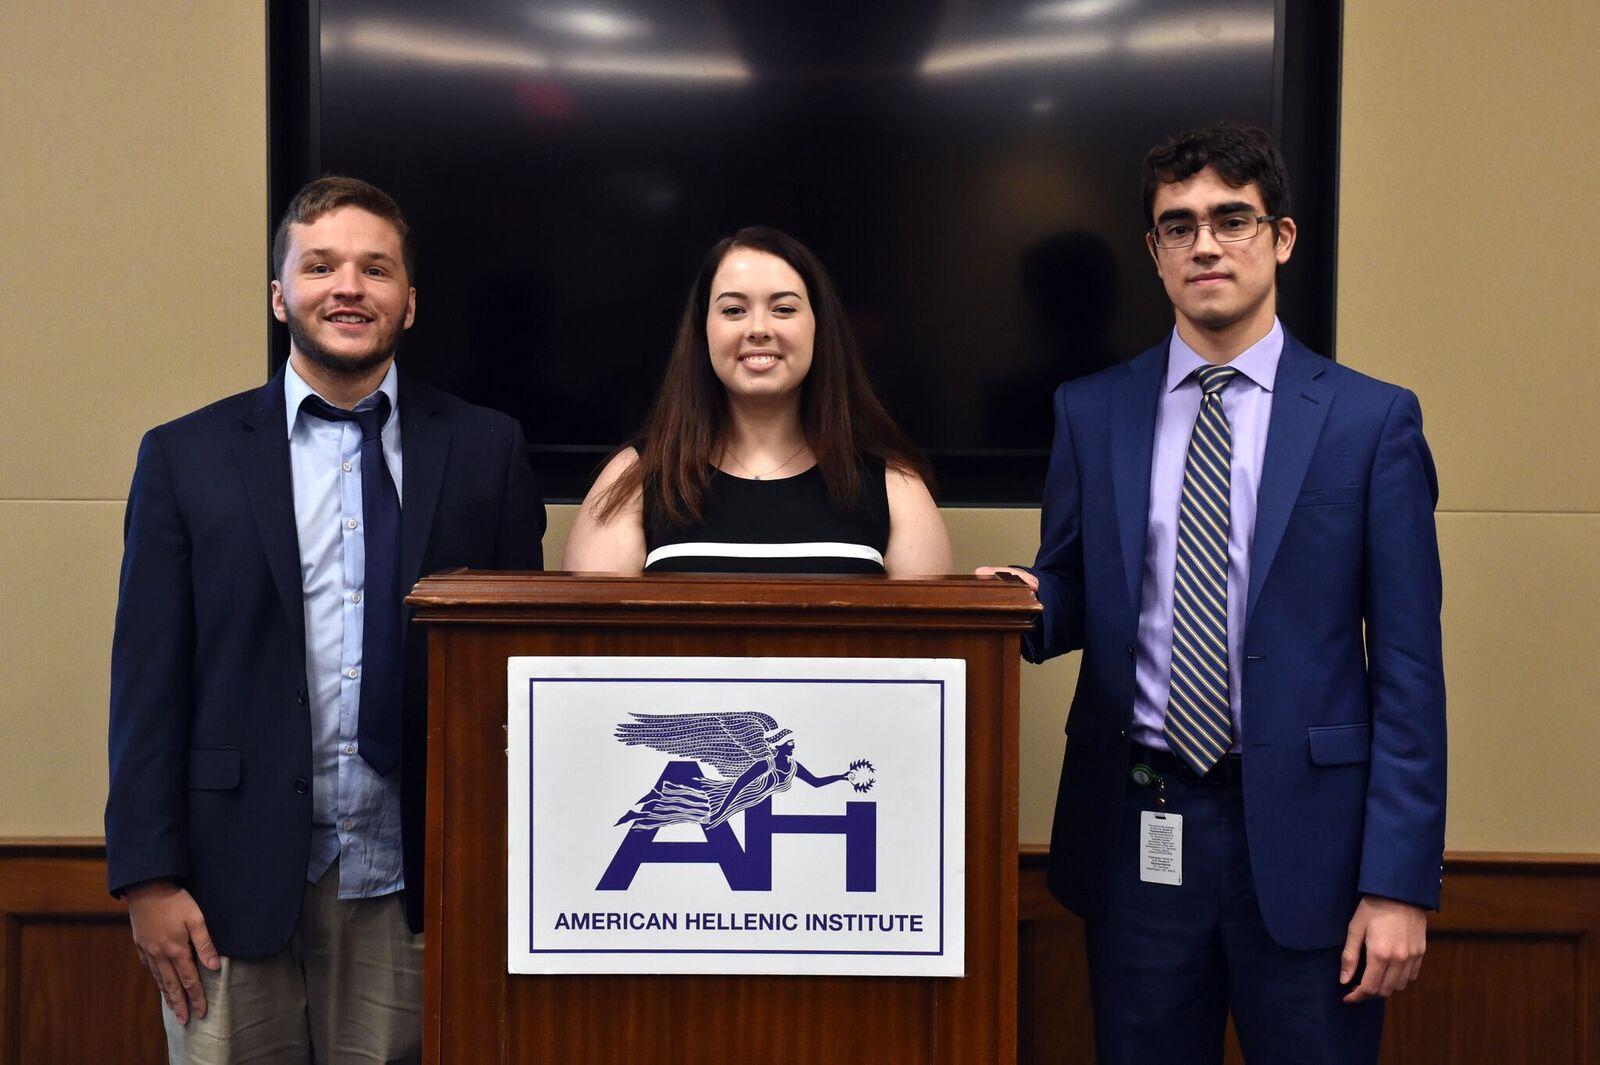 (L-R) AHI Summer Interns Konstantinos Tsarouchis, Hannah Henick, and Adonis Caramintzos